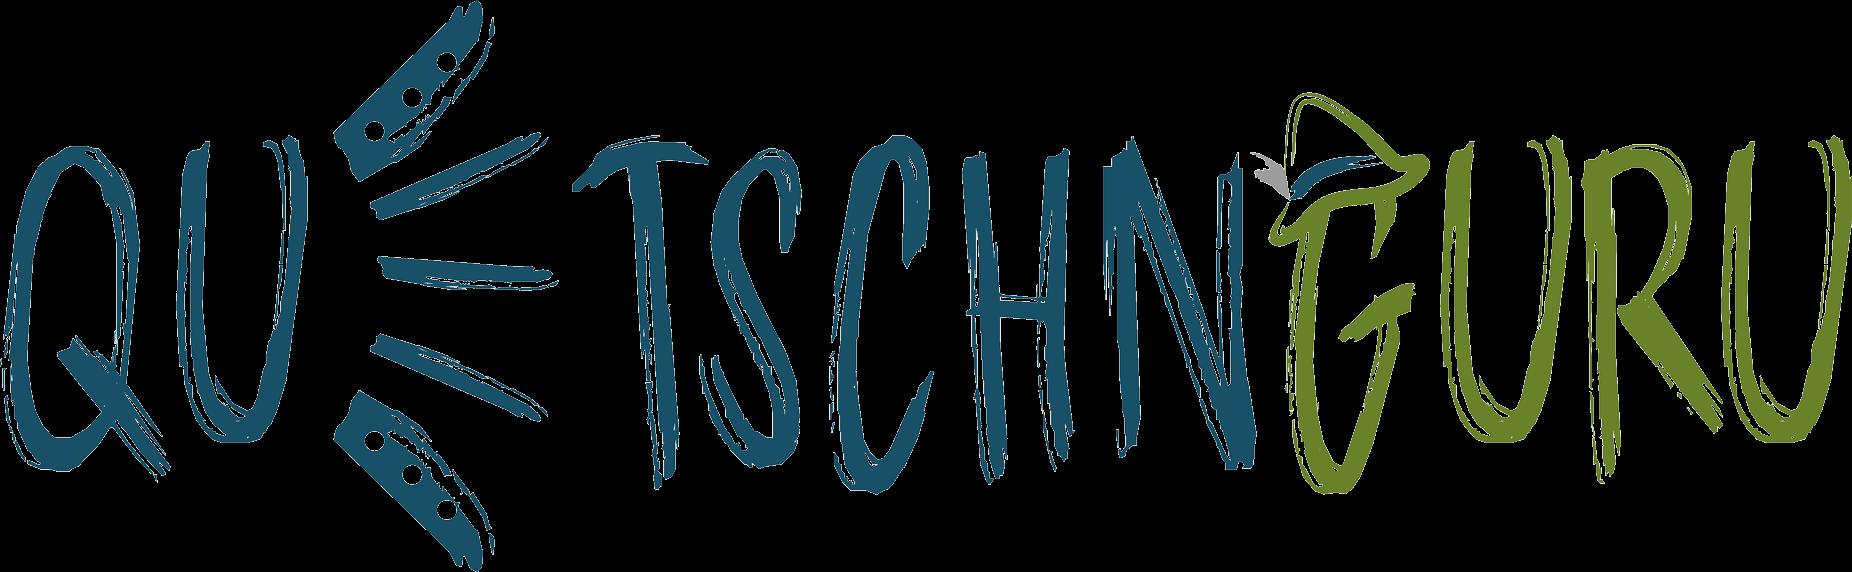 Quetschnguru Logo